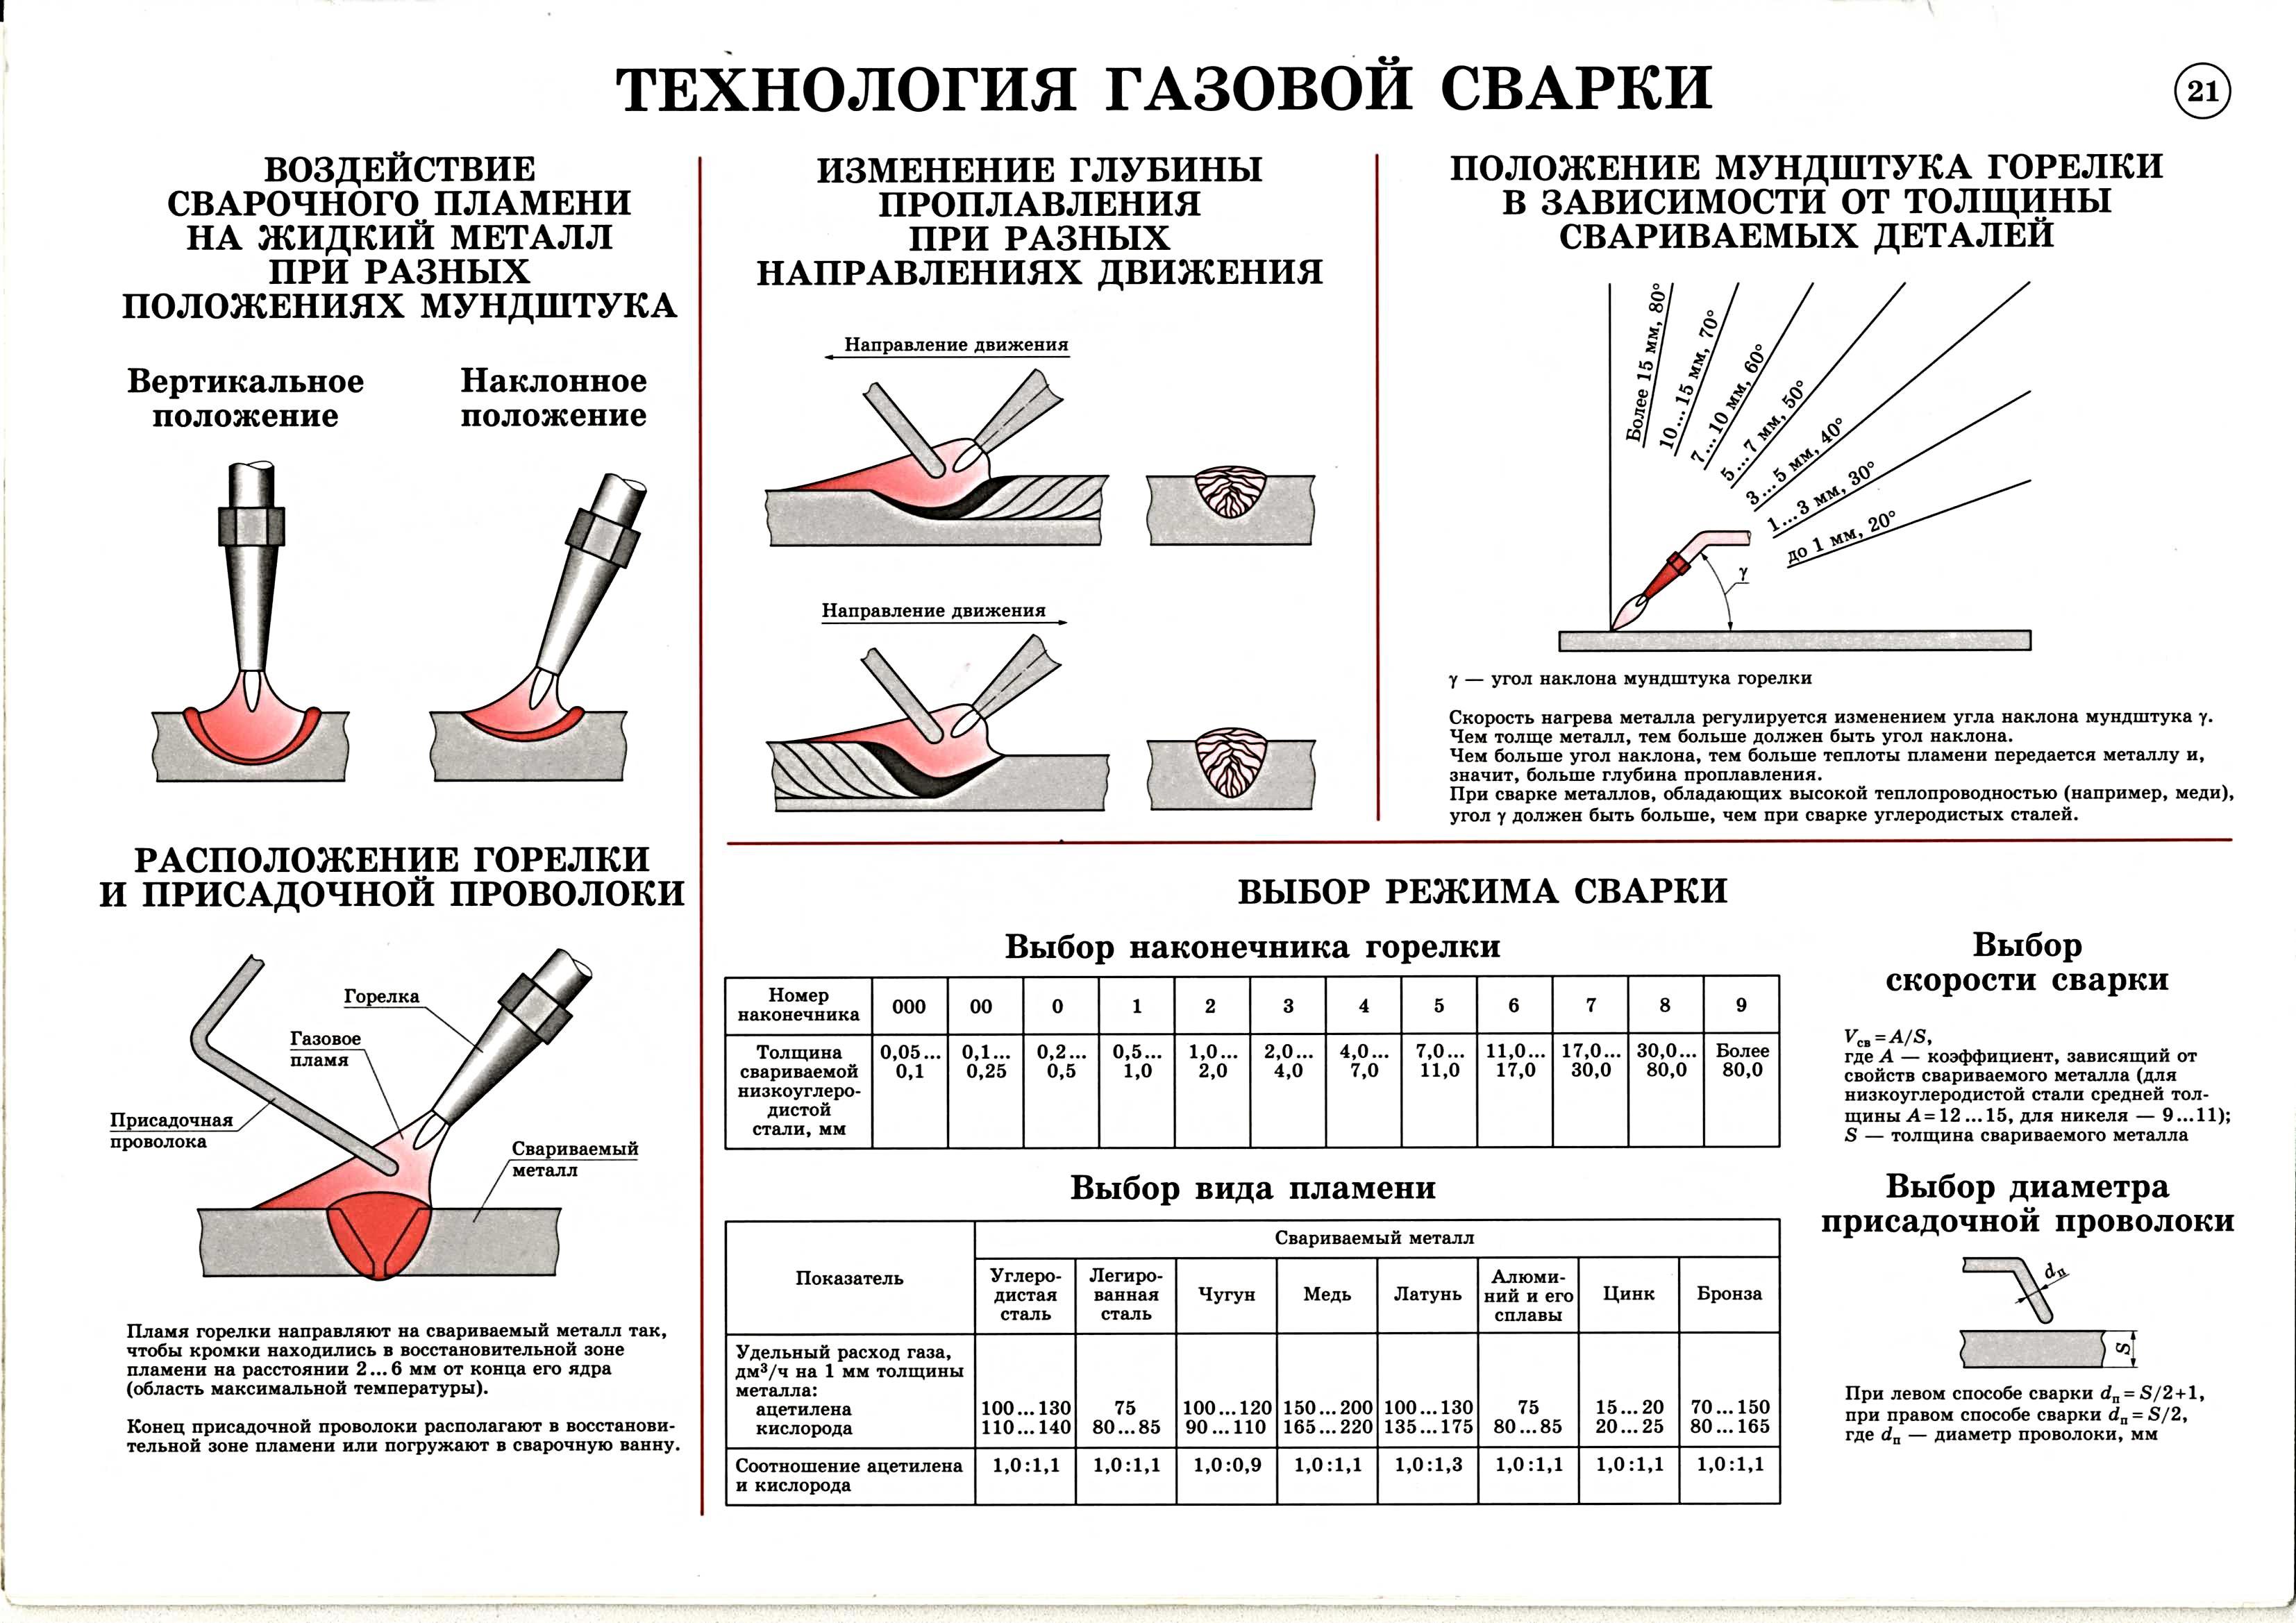 C:\Users\Татьяна\Desktop\img095.jpg